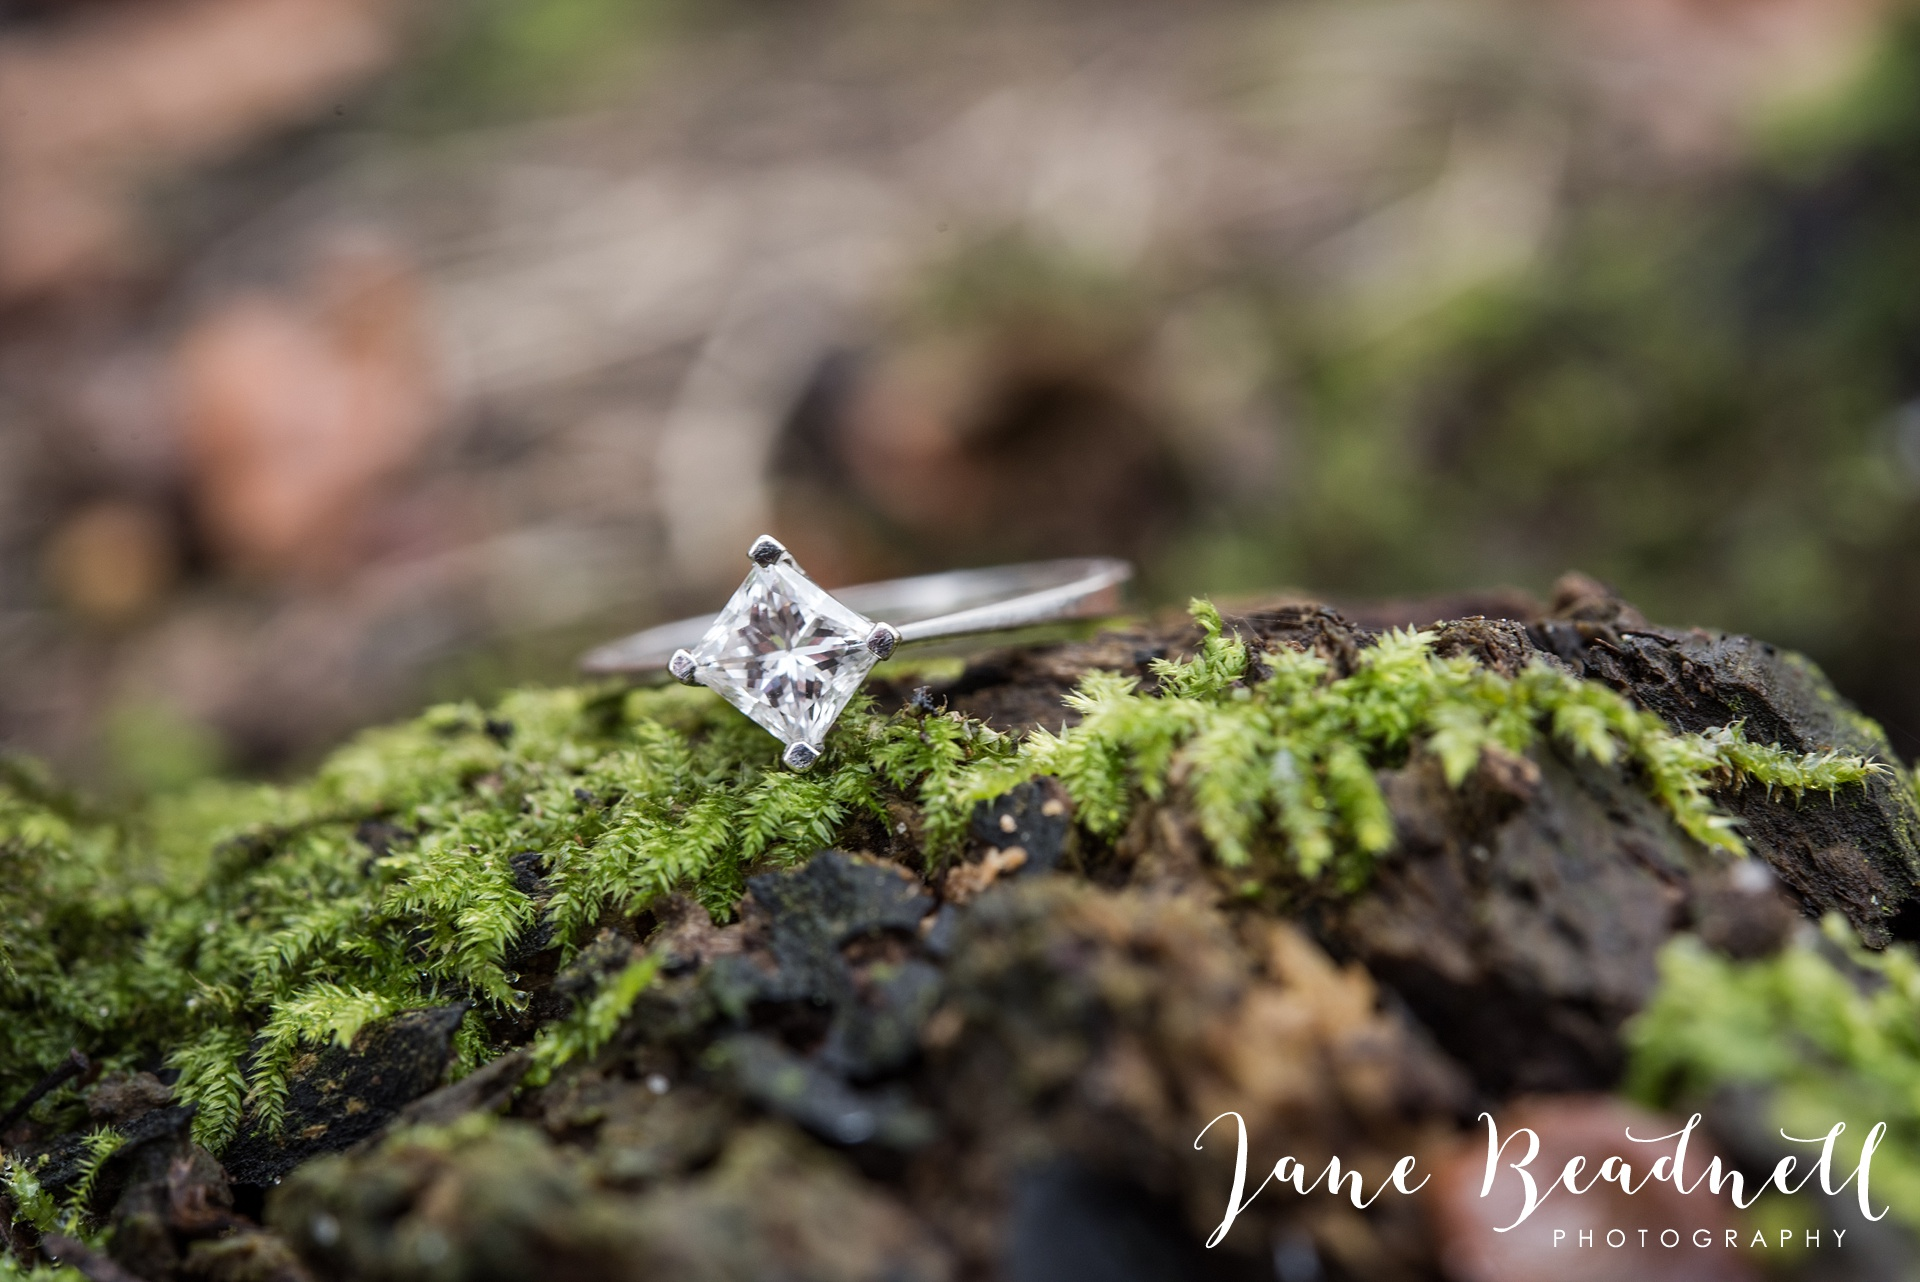 yorkshire-wedding-photographer-jane-beadnell-photography-uk-and-destination-wedding-photographer-engagement-shoot_0038